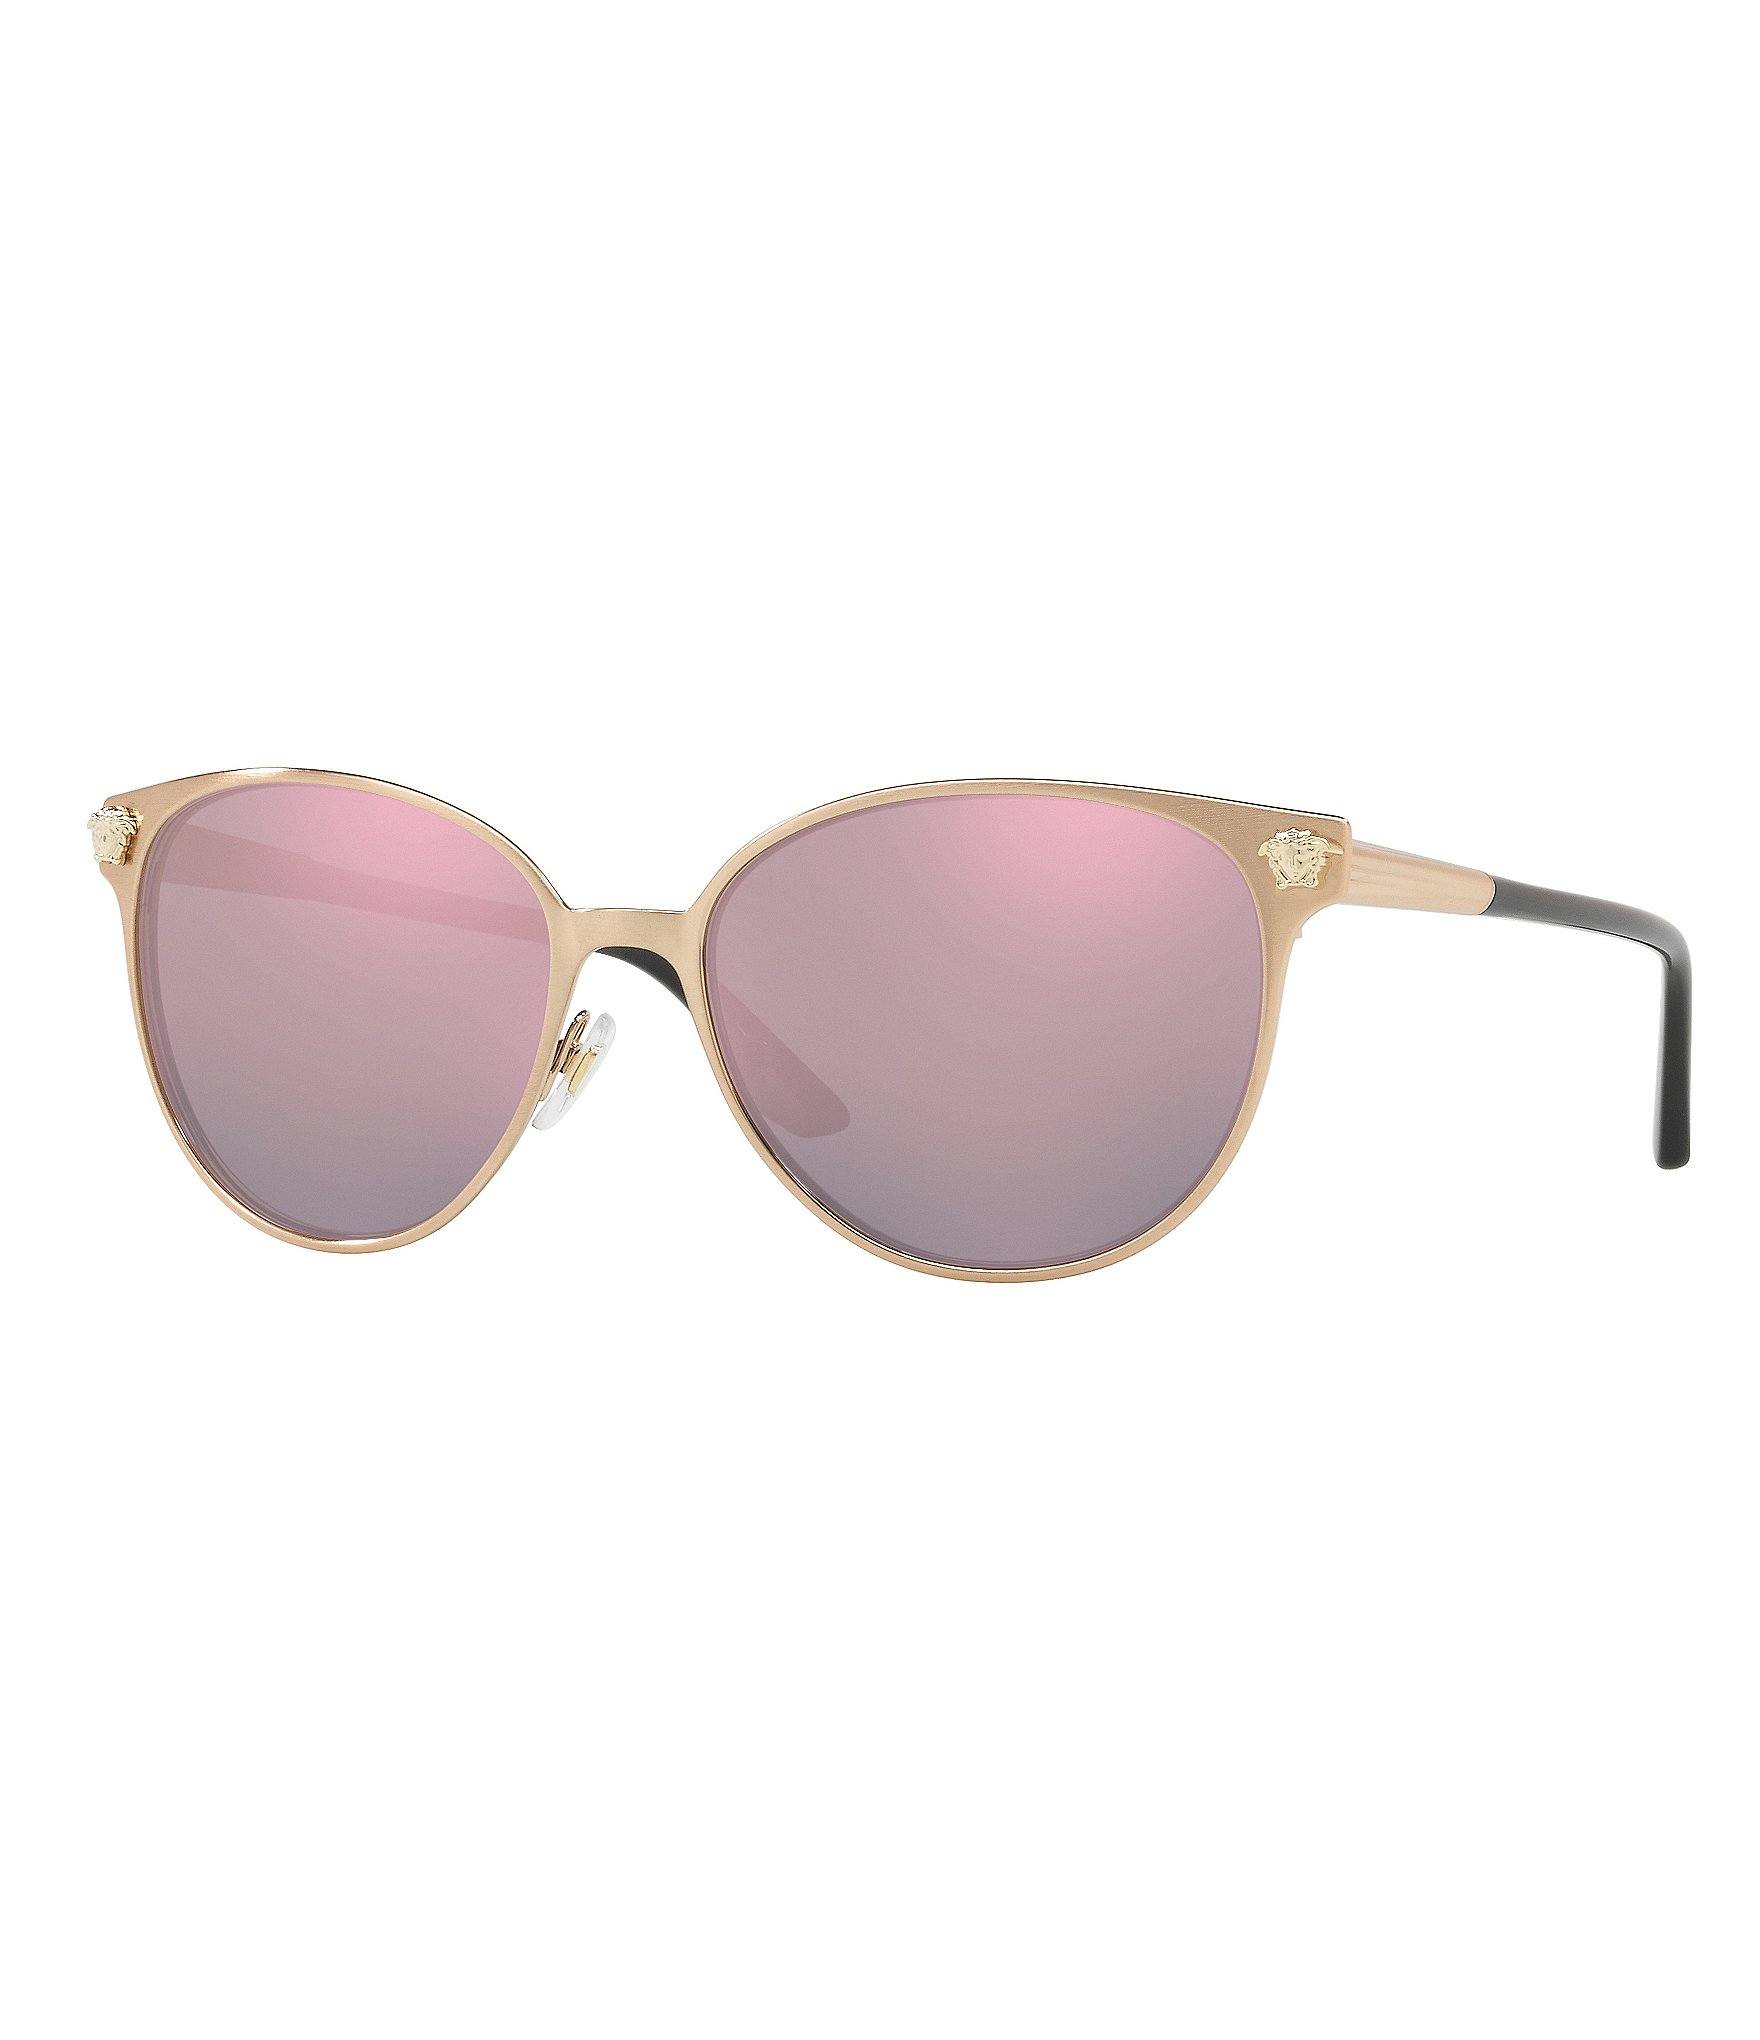 b5f5c949ea Versace Sunglasses   Eyewear